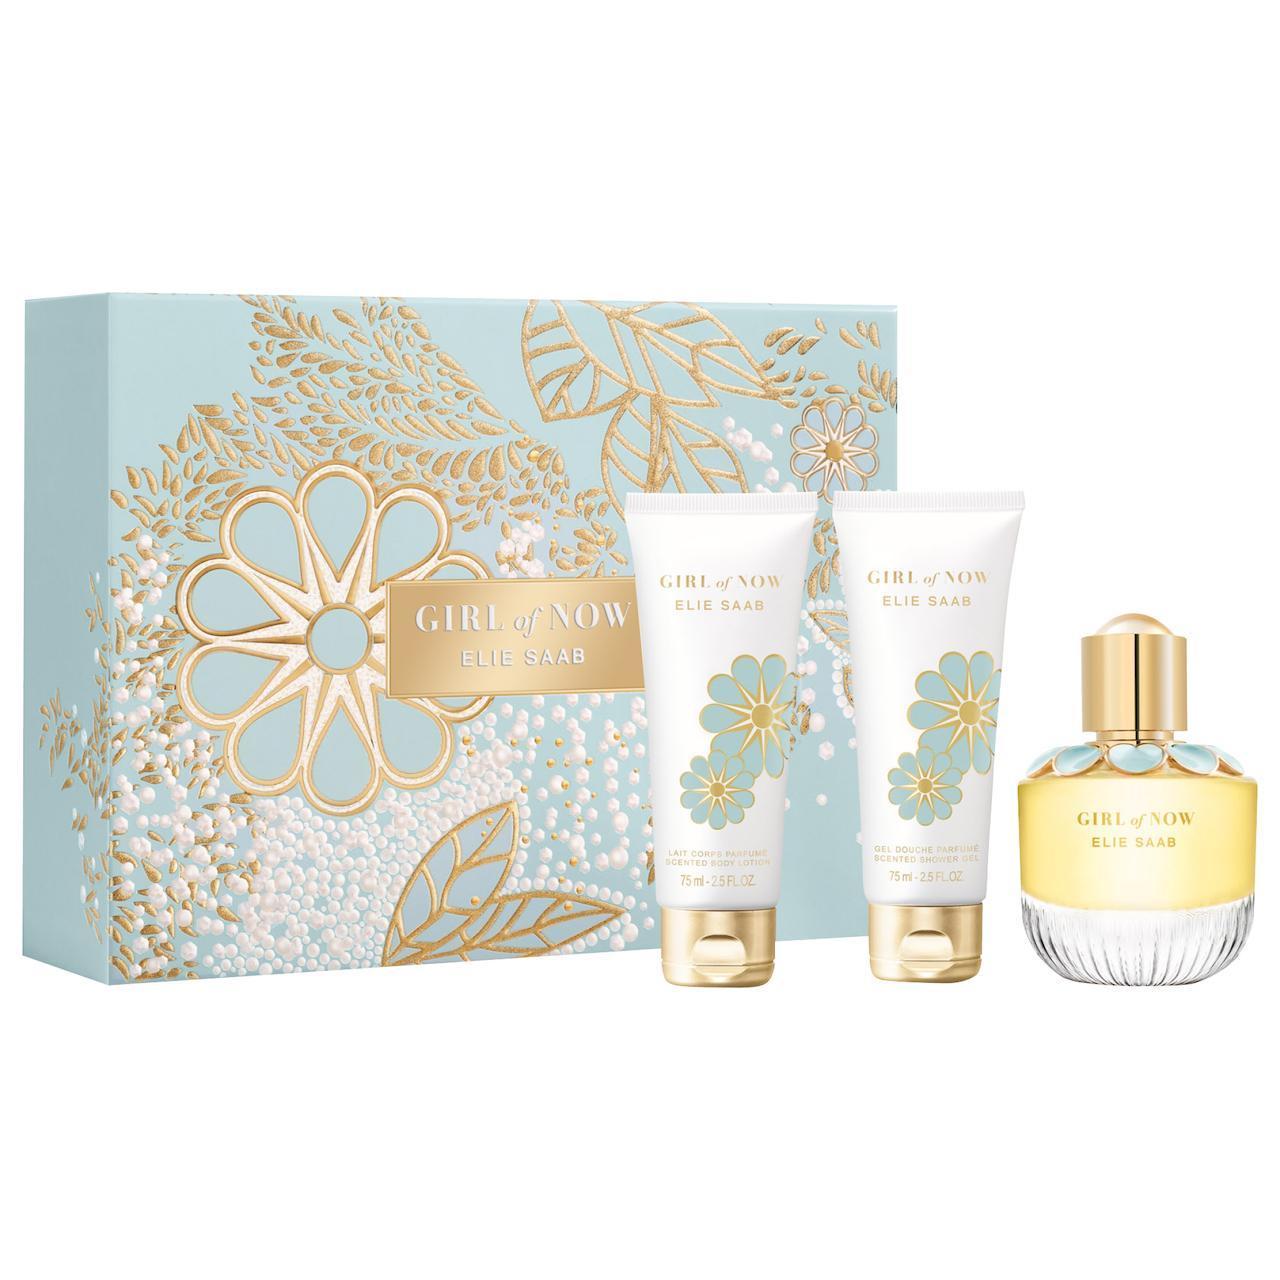 Elie Saab Girl of Now Eau De Parfum 50ml Gift Set £32.50 @ Fabled By Marie Claire